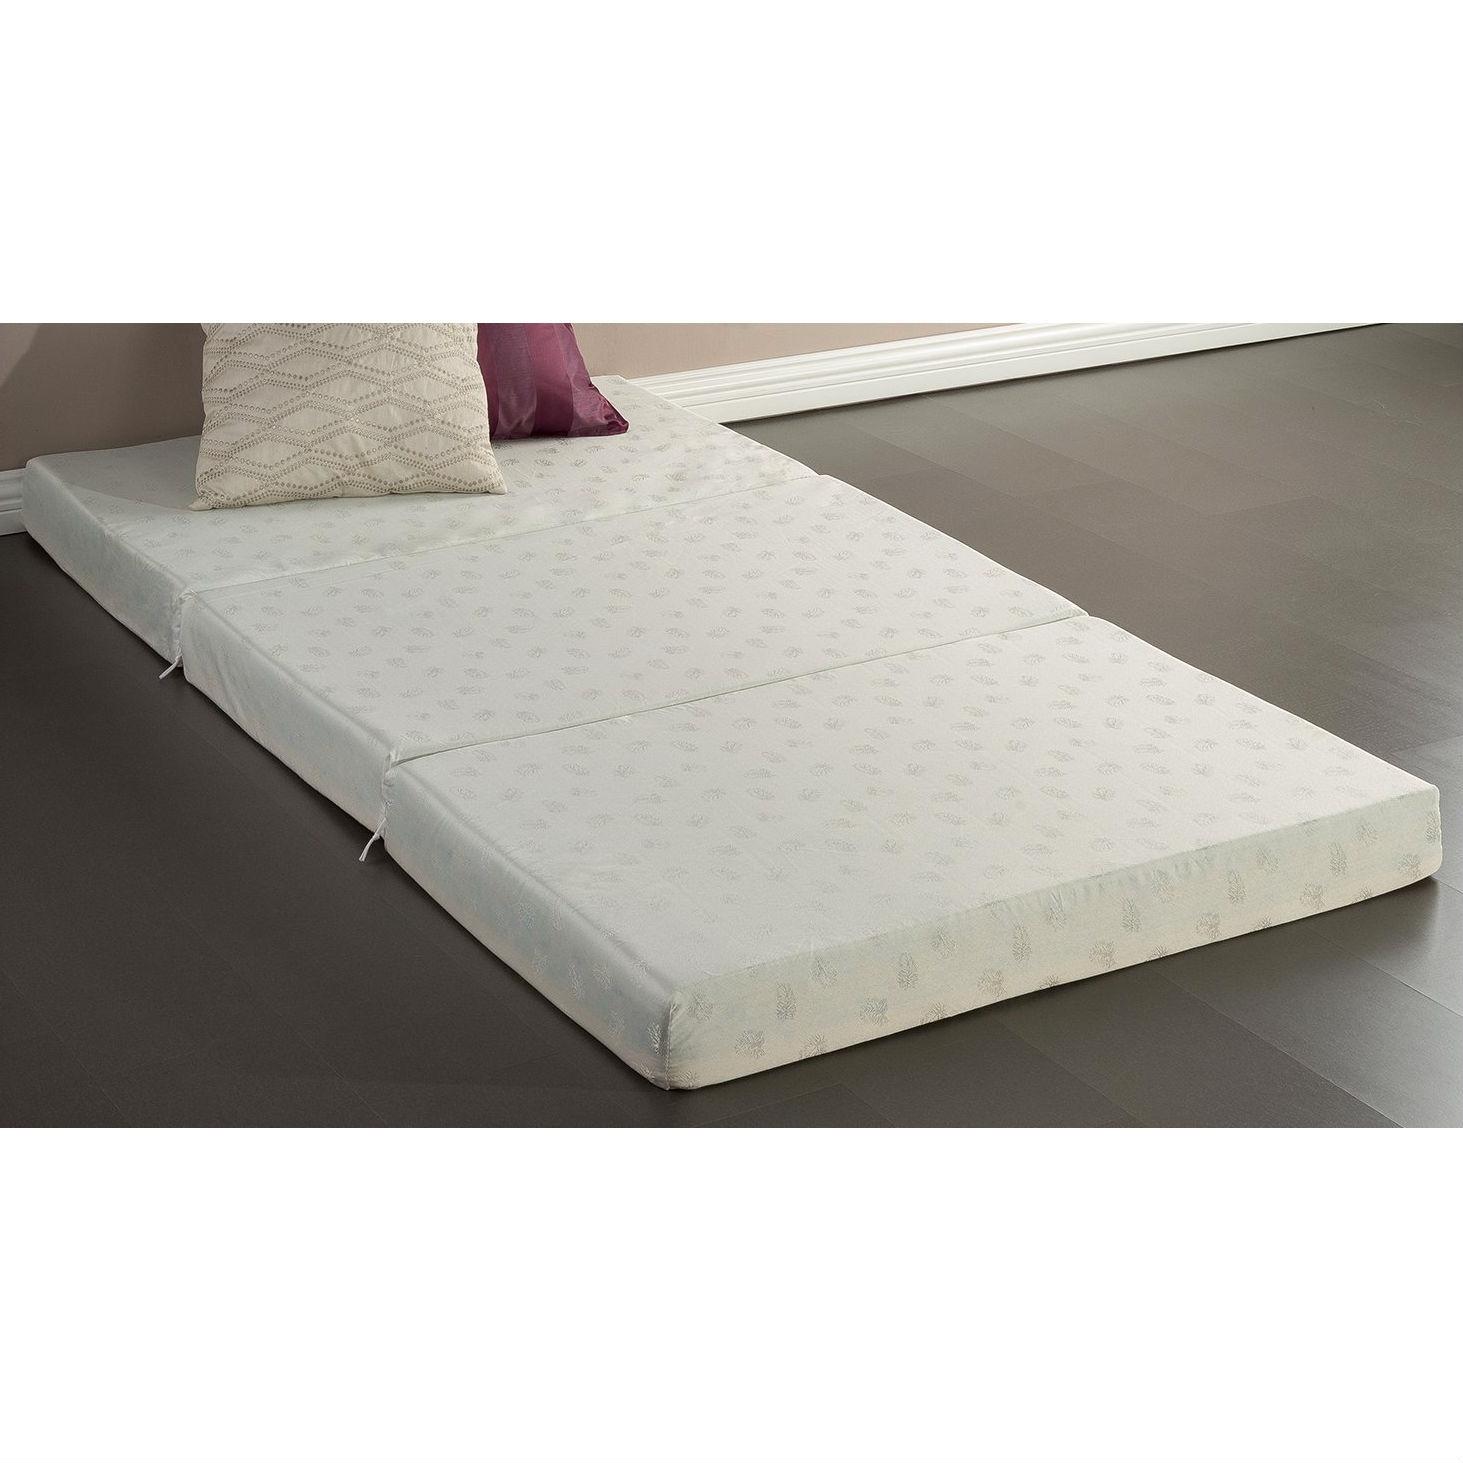 - Twin Size 4-inch Thick Memory Foam Guest Bed Mat Folding Mattress